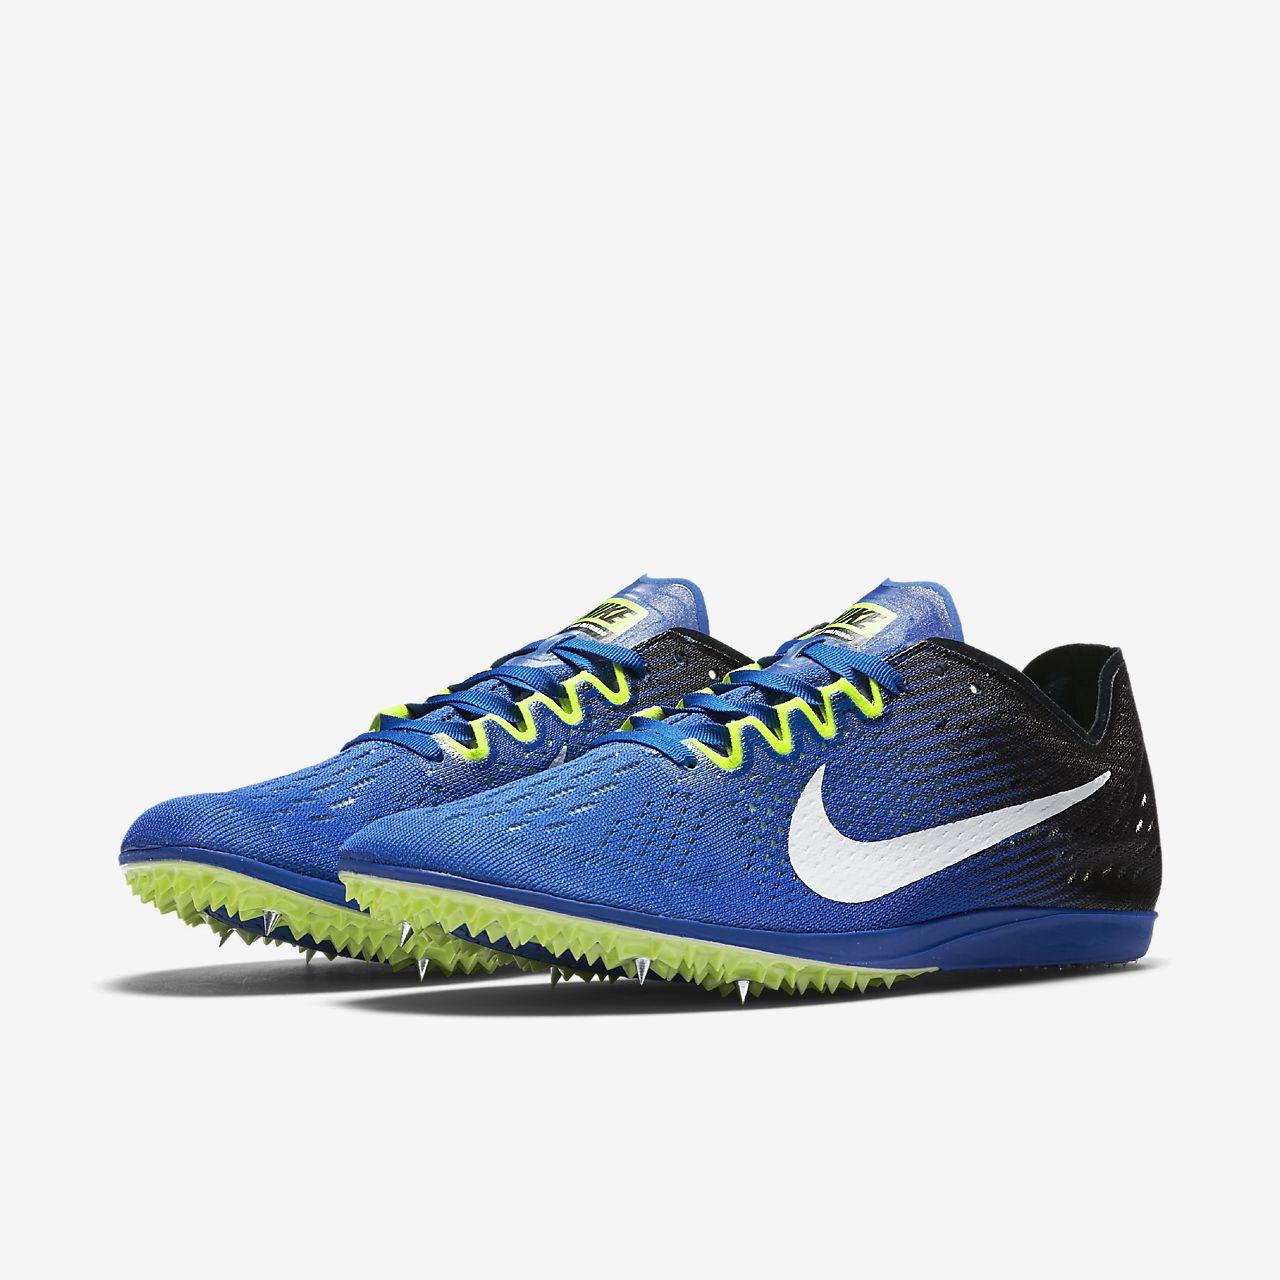 reputable site aa341 b7009 ... Nike Zoom Matumbo 3 Unisex Distance Spike